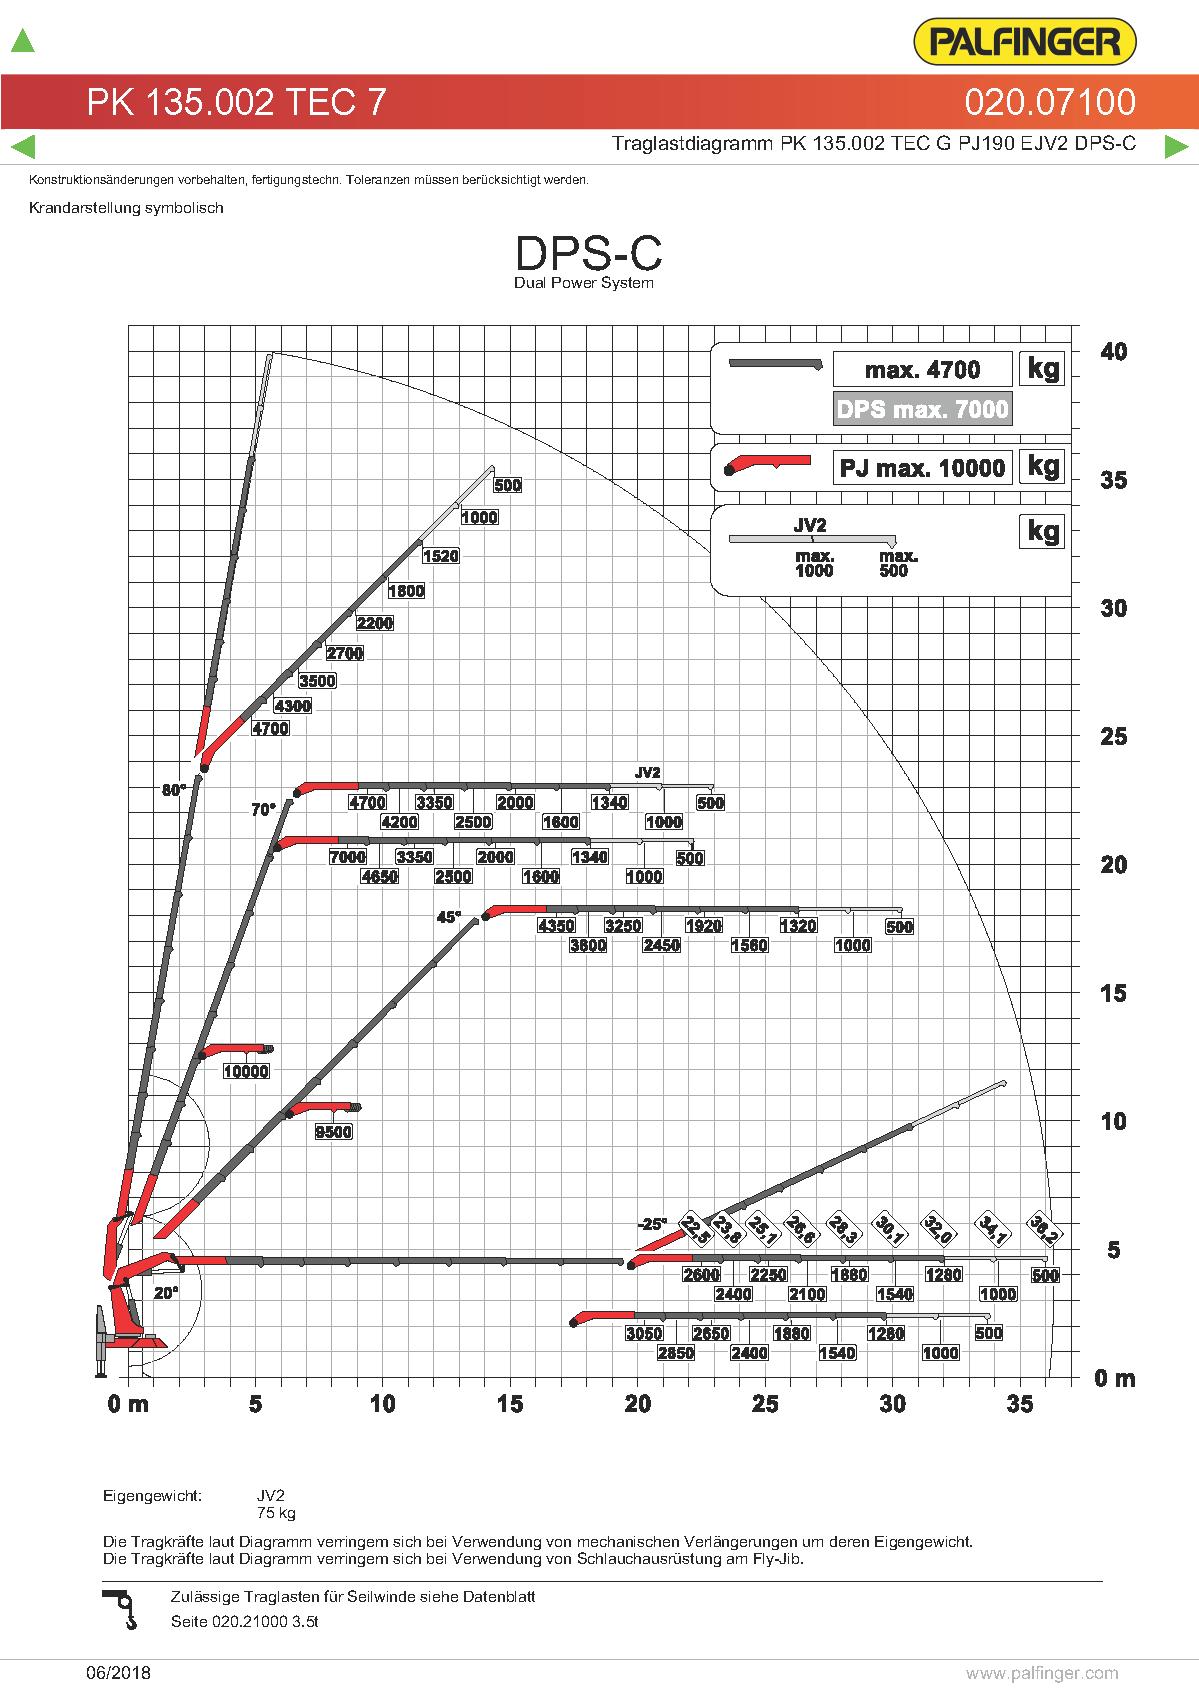 PK135.002 TEC 7 G PJ190E (1)